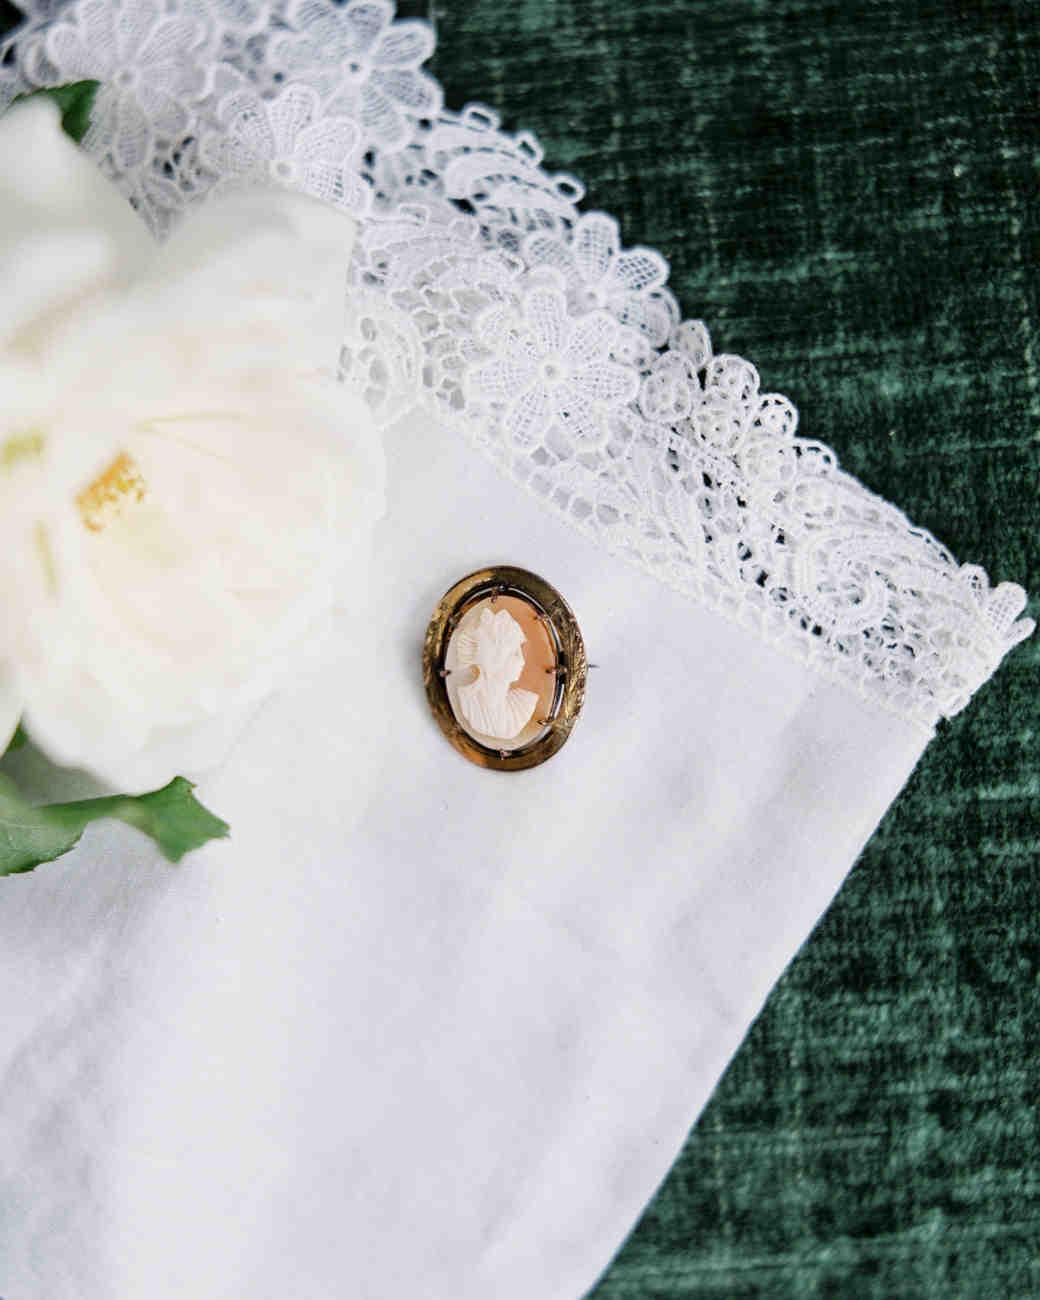 christine-dagan-wedding-cameo-4309_16-s113011-0616.jpg